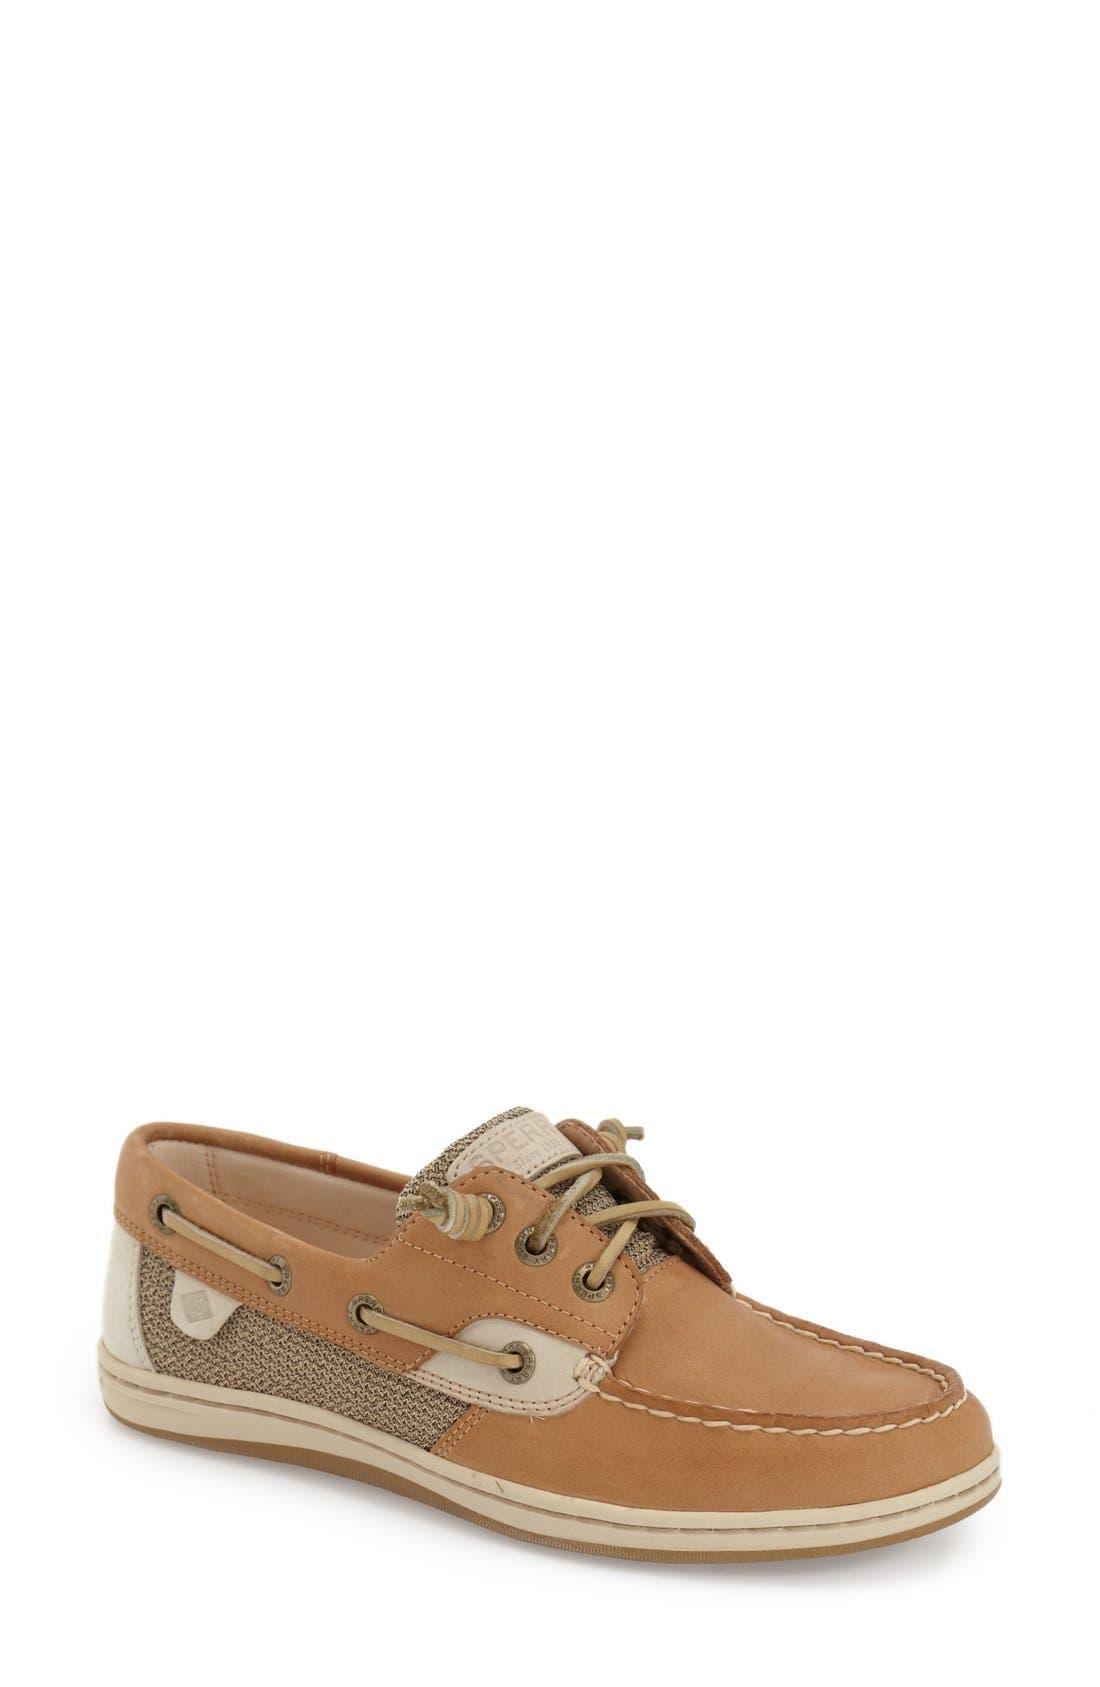 'Songfish' Boat Shoe,                         Main,                         color, LINEN/ OAT